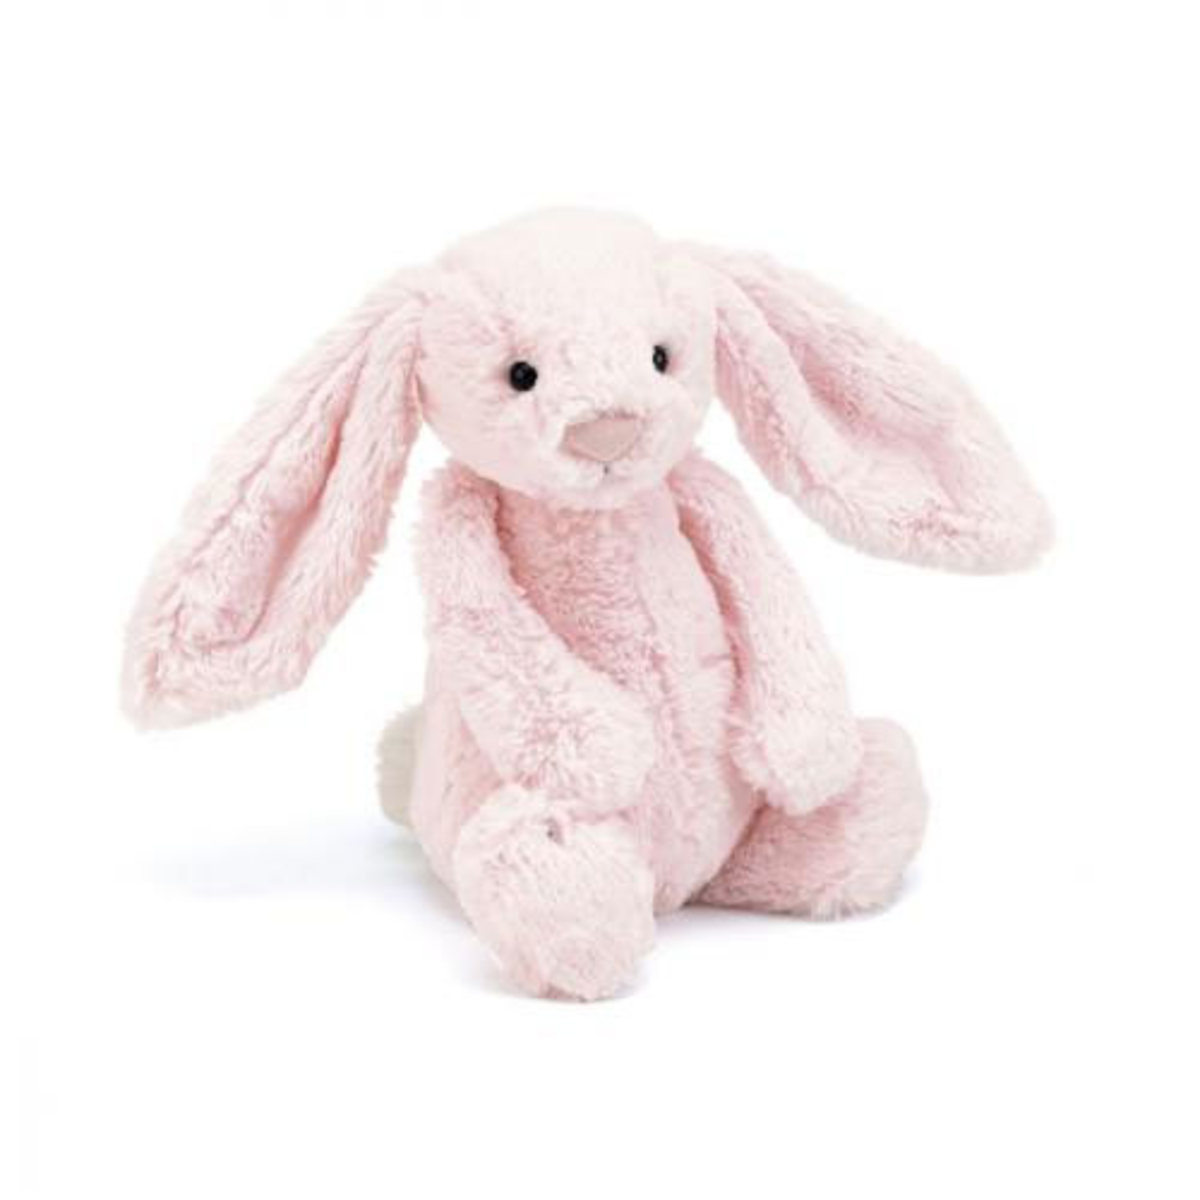 Peluche Bashful Pink Bunny - Medium Bashful Pink Bunny - Medium